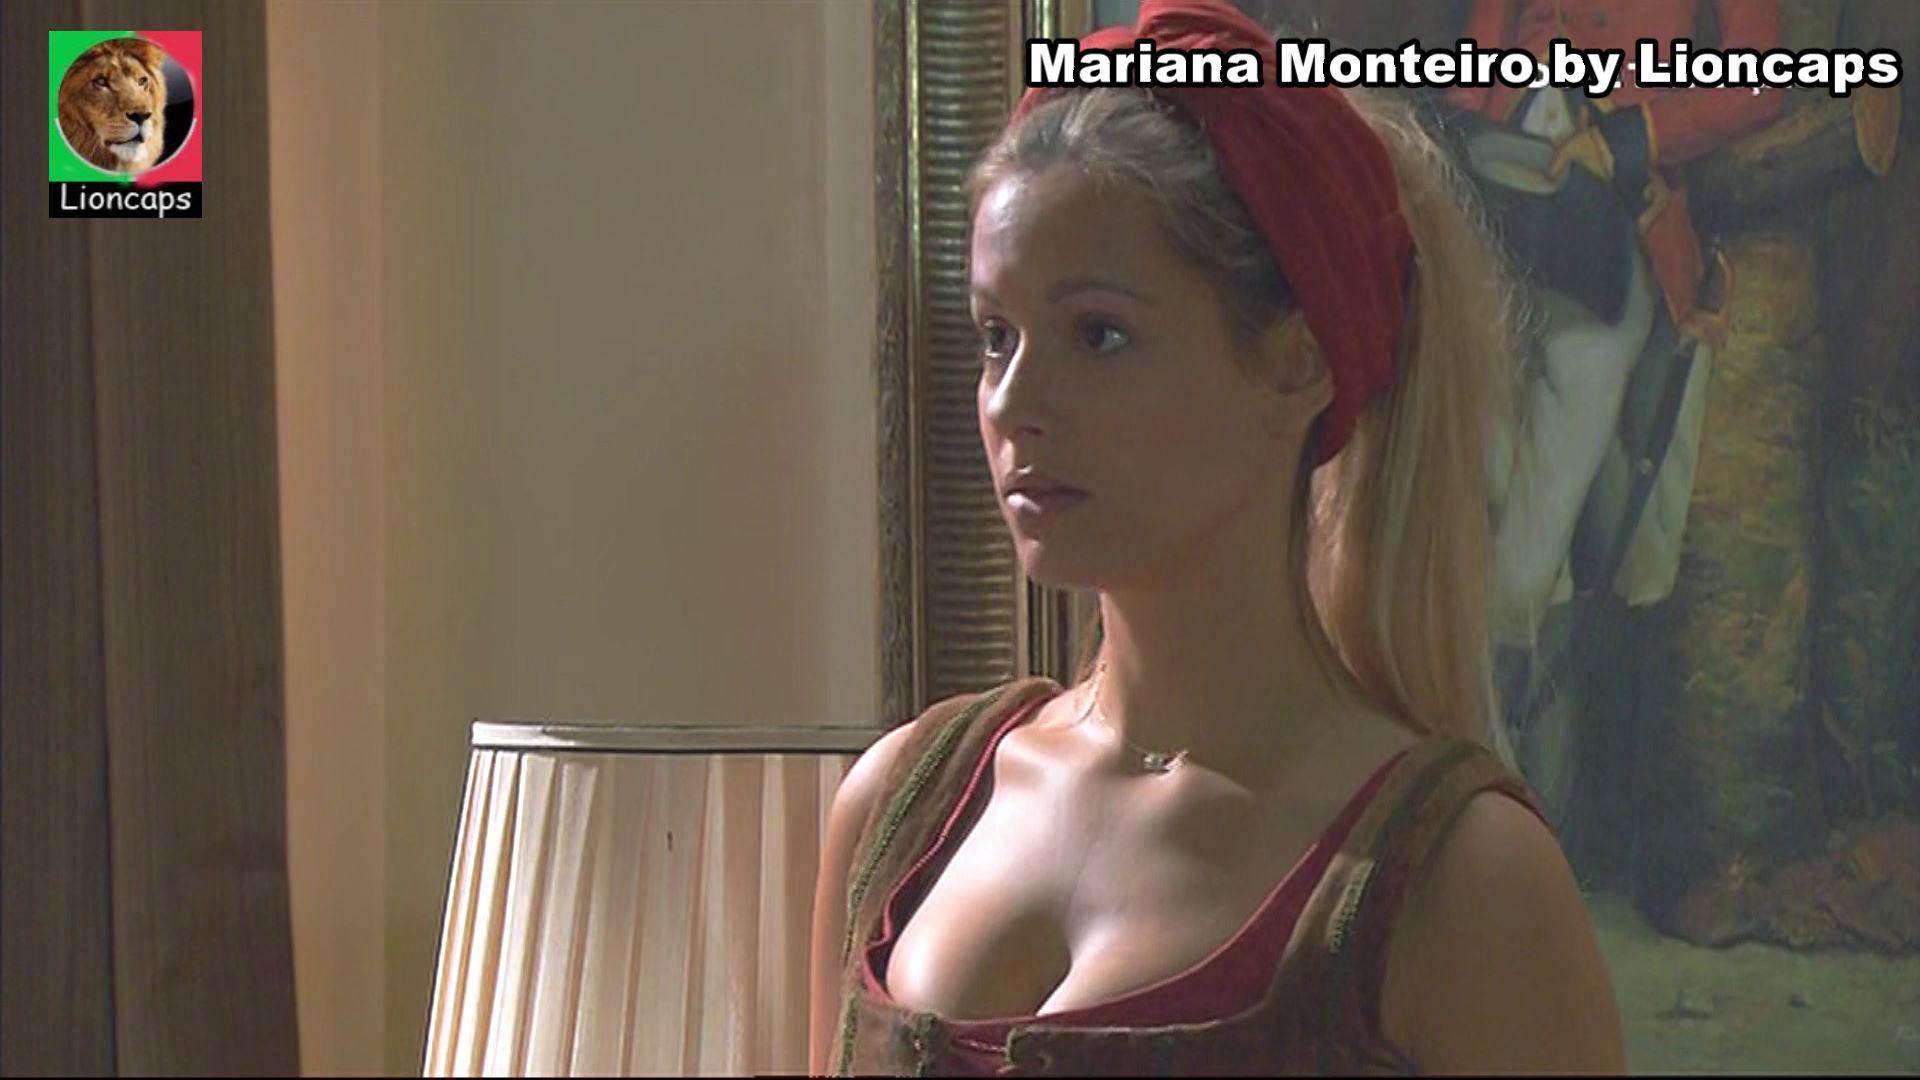 738382994_mariana_monteiro_vs190209_19213_122_538lo.JPG